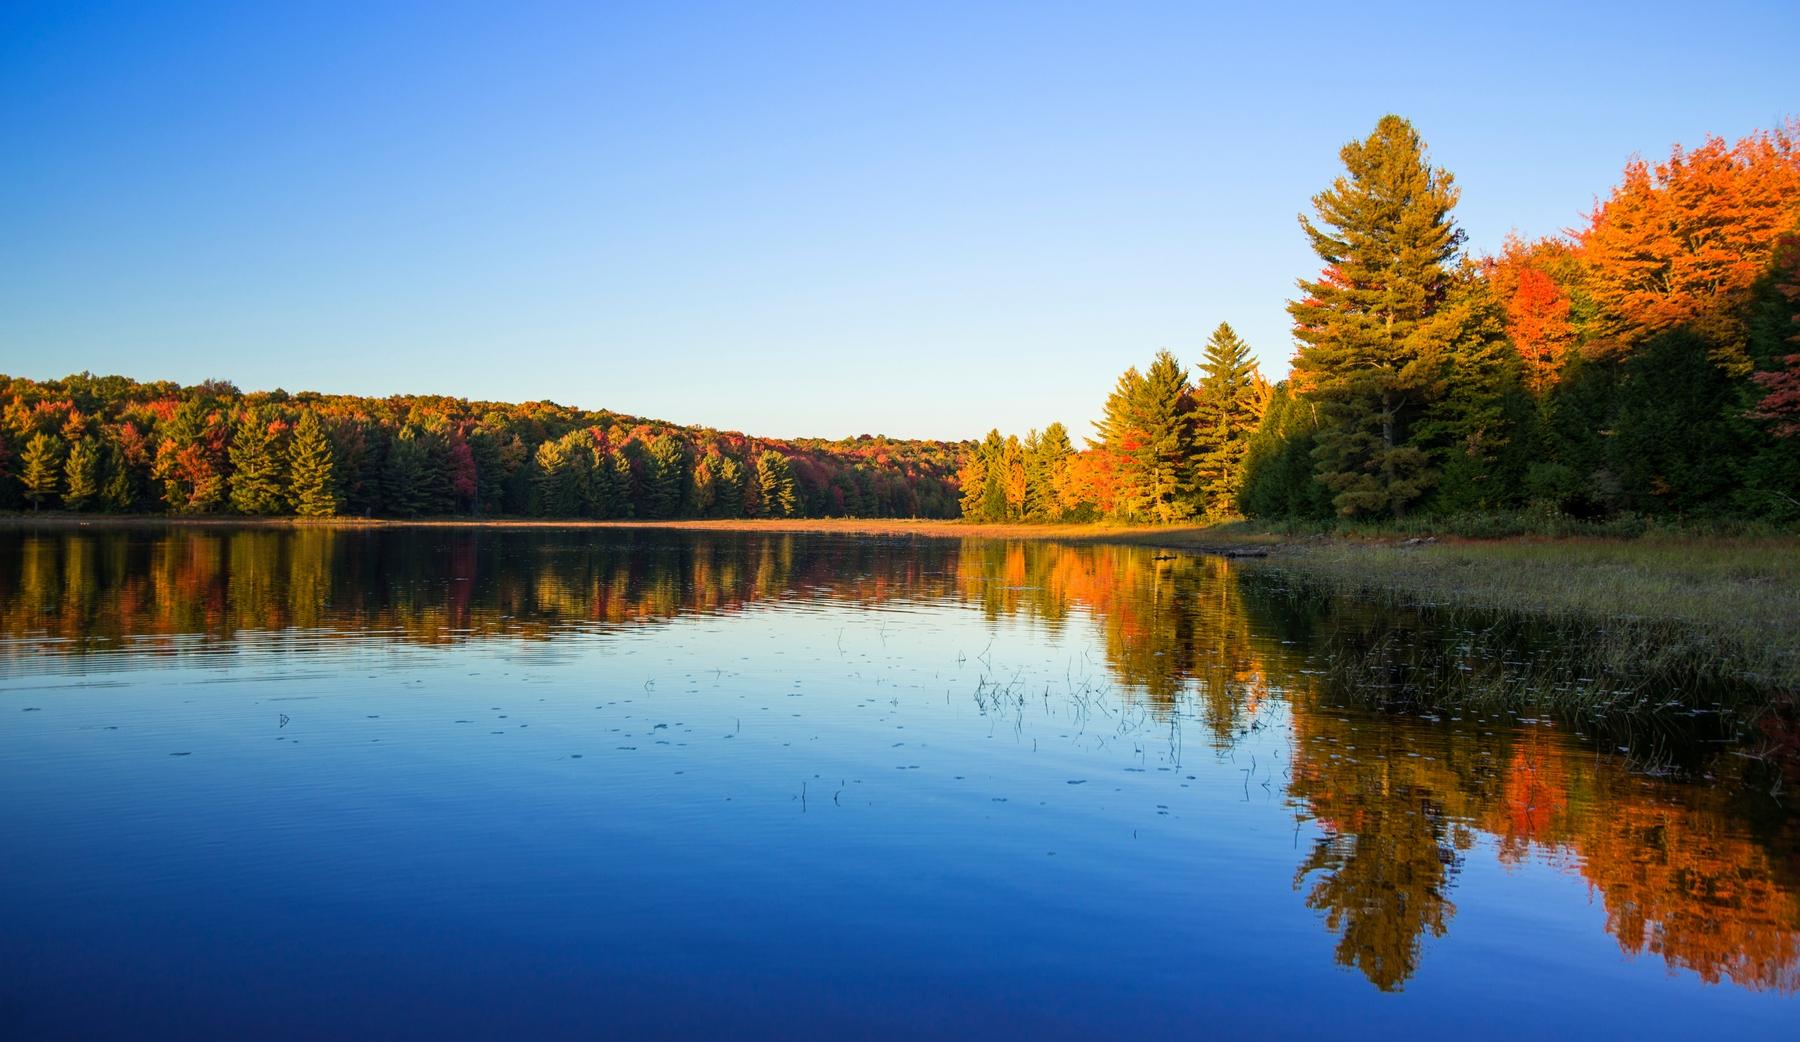 lake in Algonquin park in Ontario